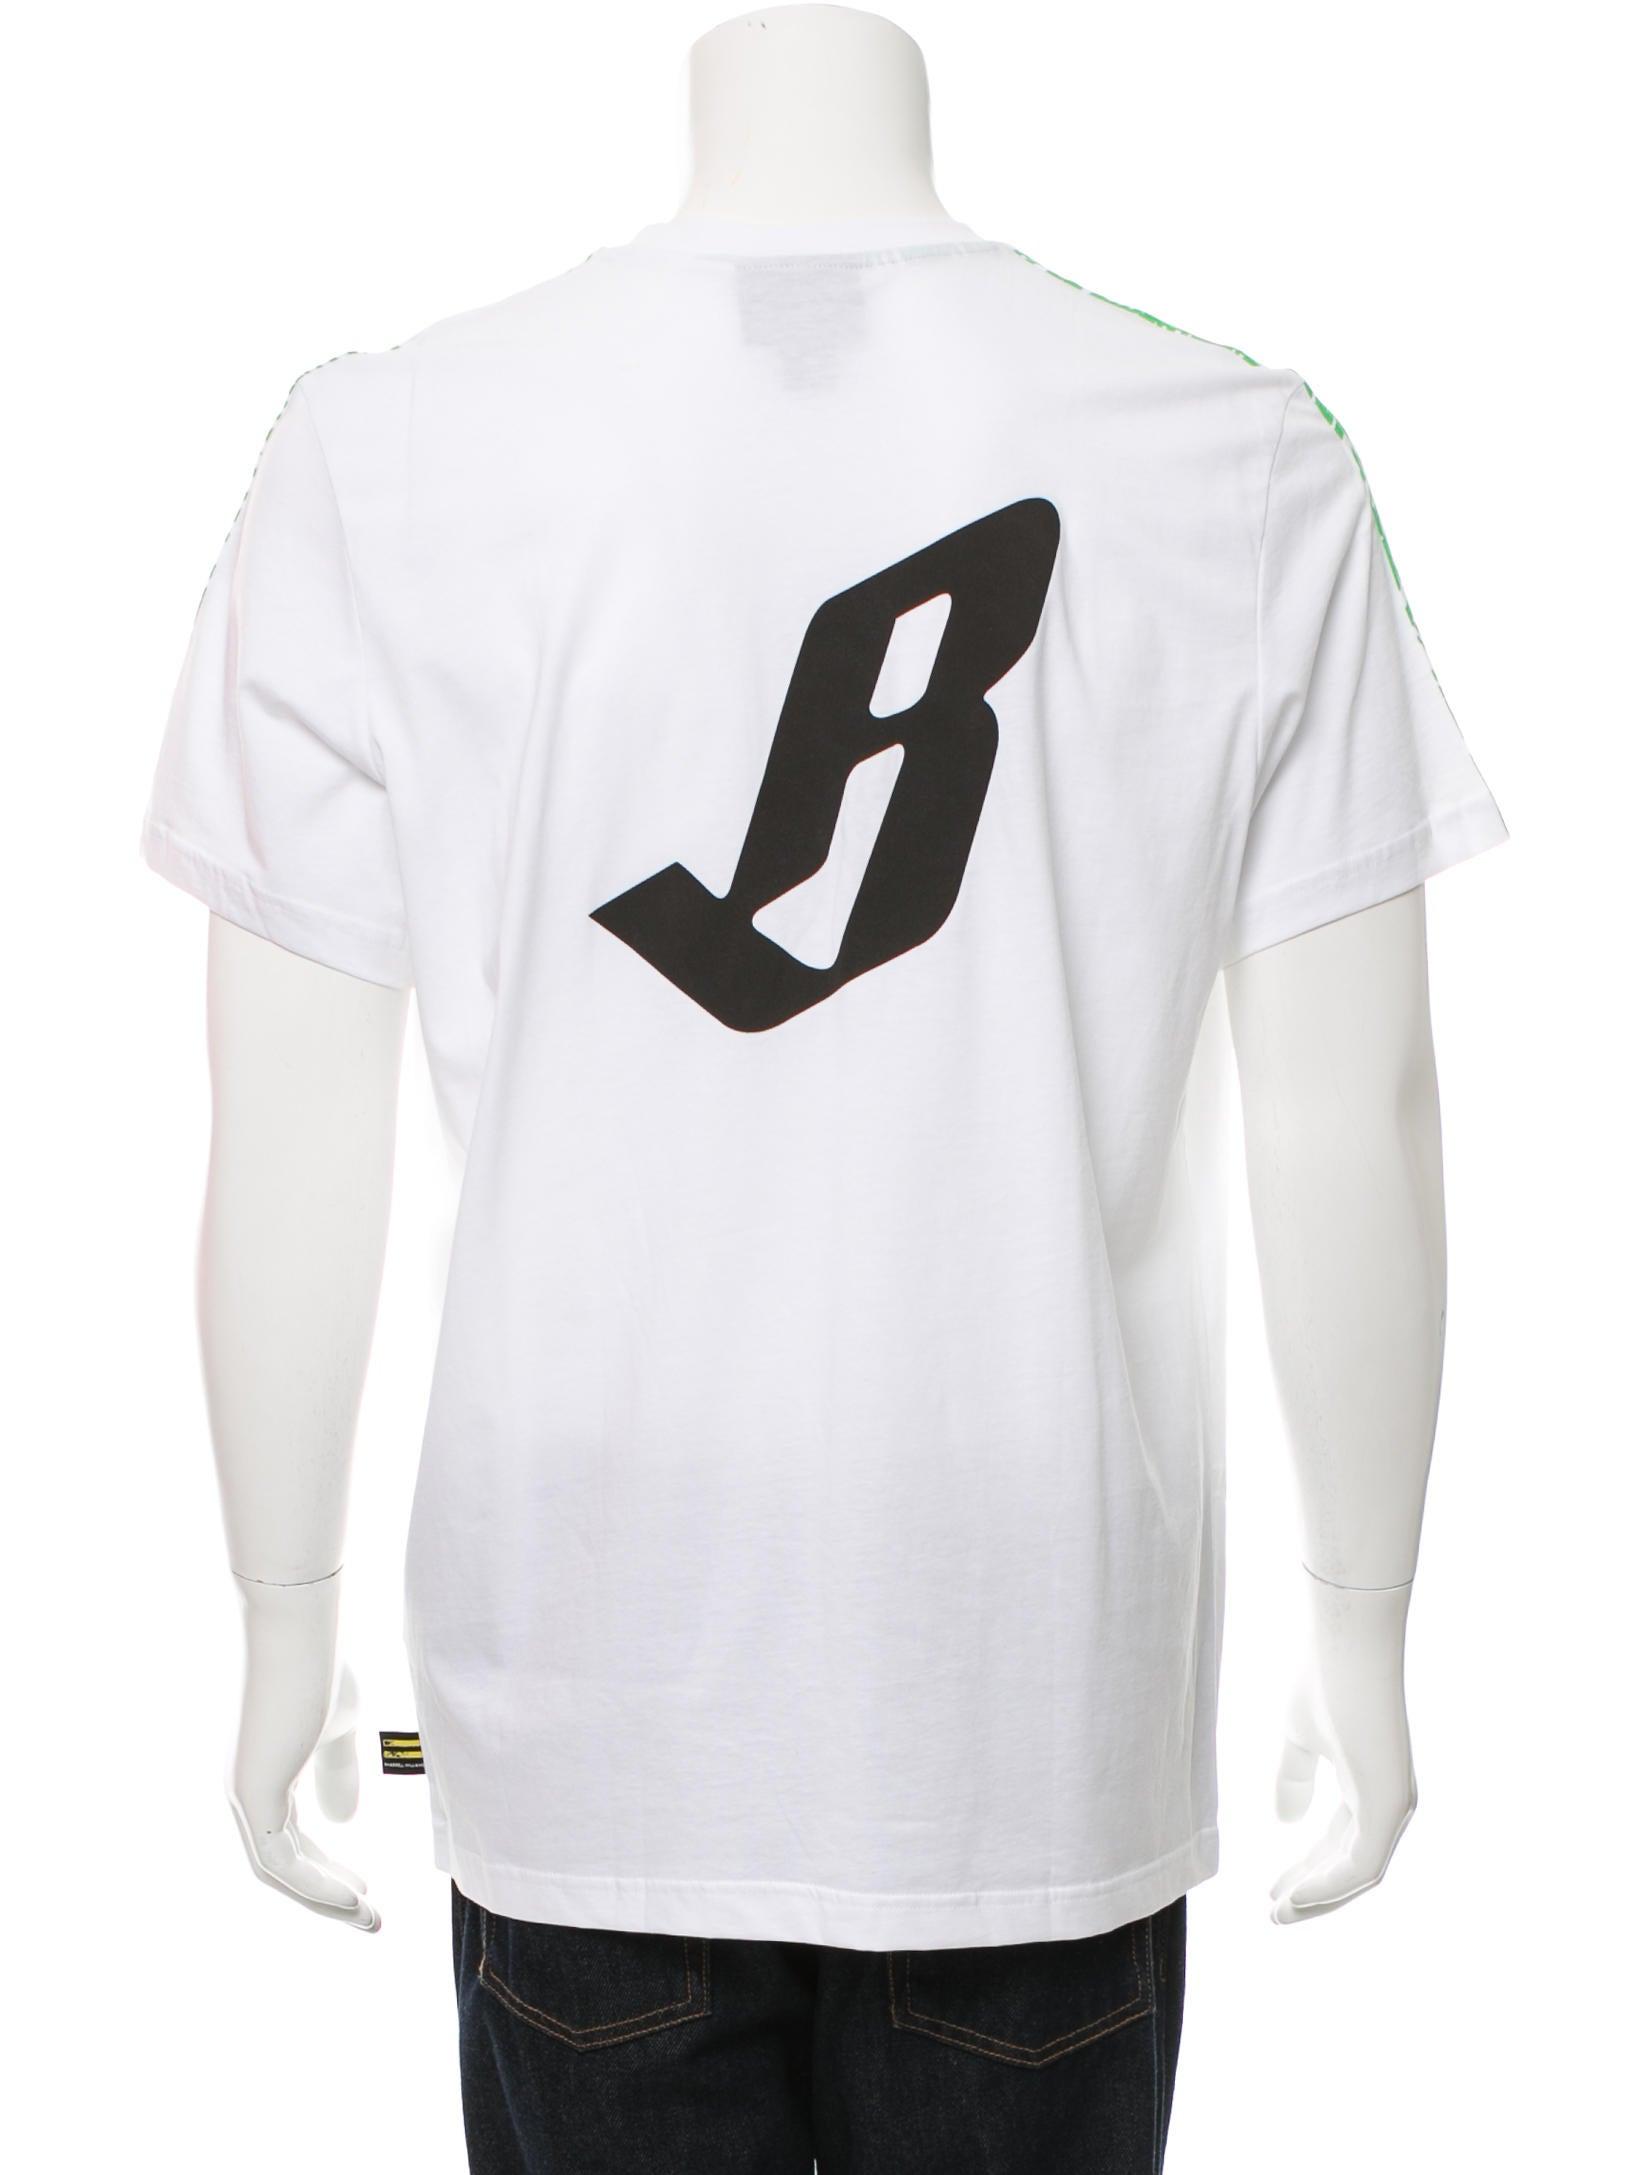 Adidas logo embroidered leaf print t shirt clothing for Shirt with logo embroidered